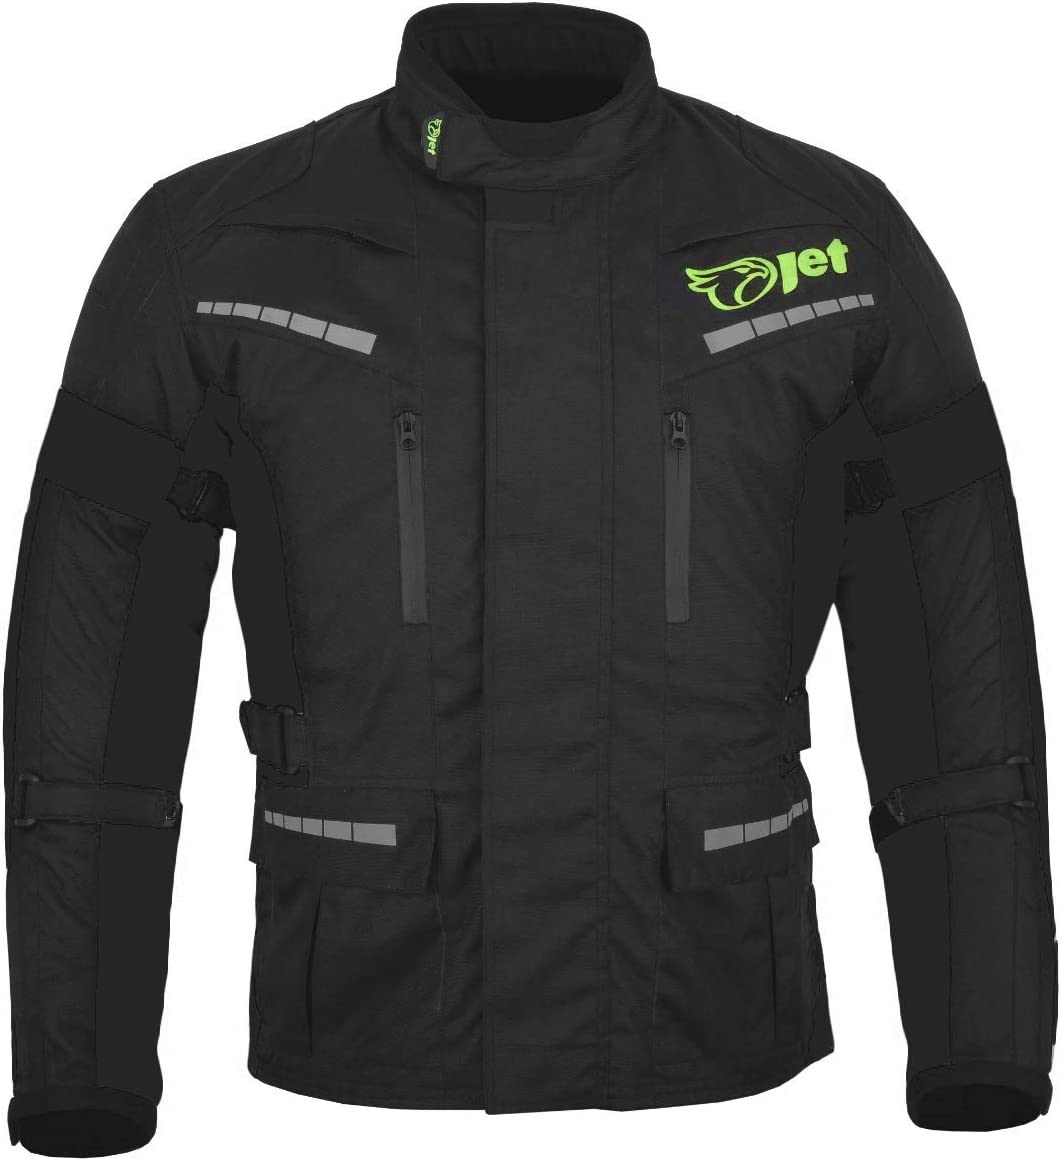 negro completo, 7XL Jet Black Fluro Textile 54-56 pulgadas Chaqueta de moto impermeable con blindaje CE